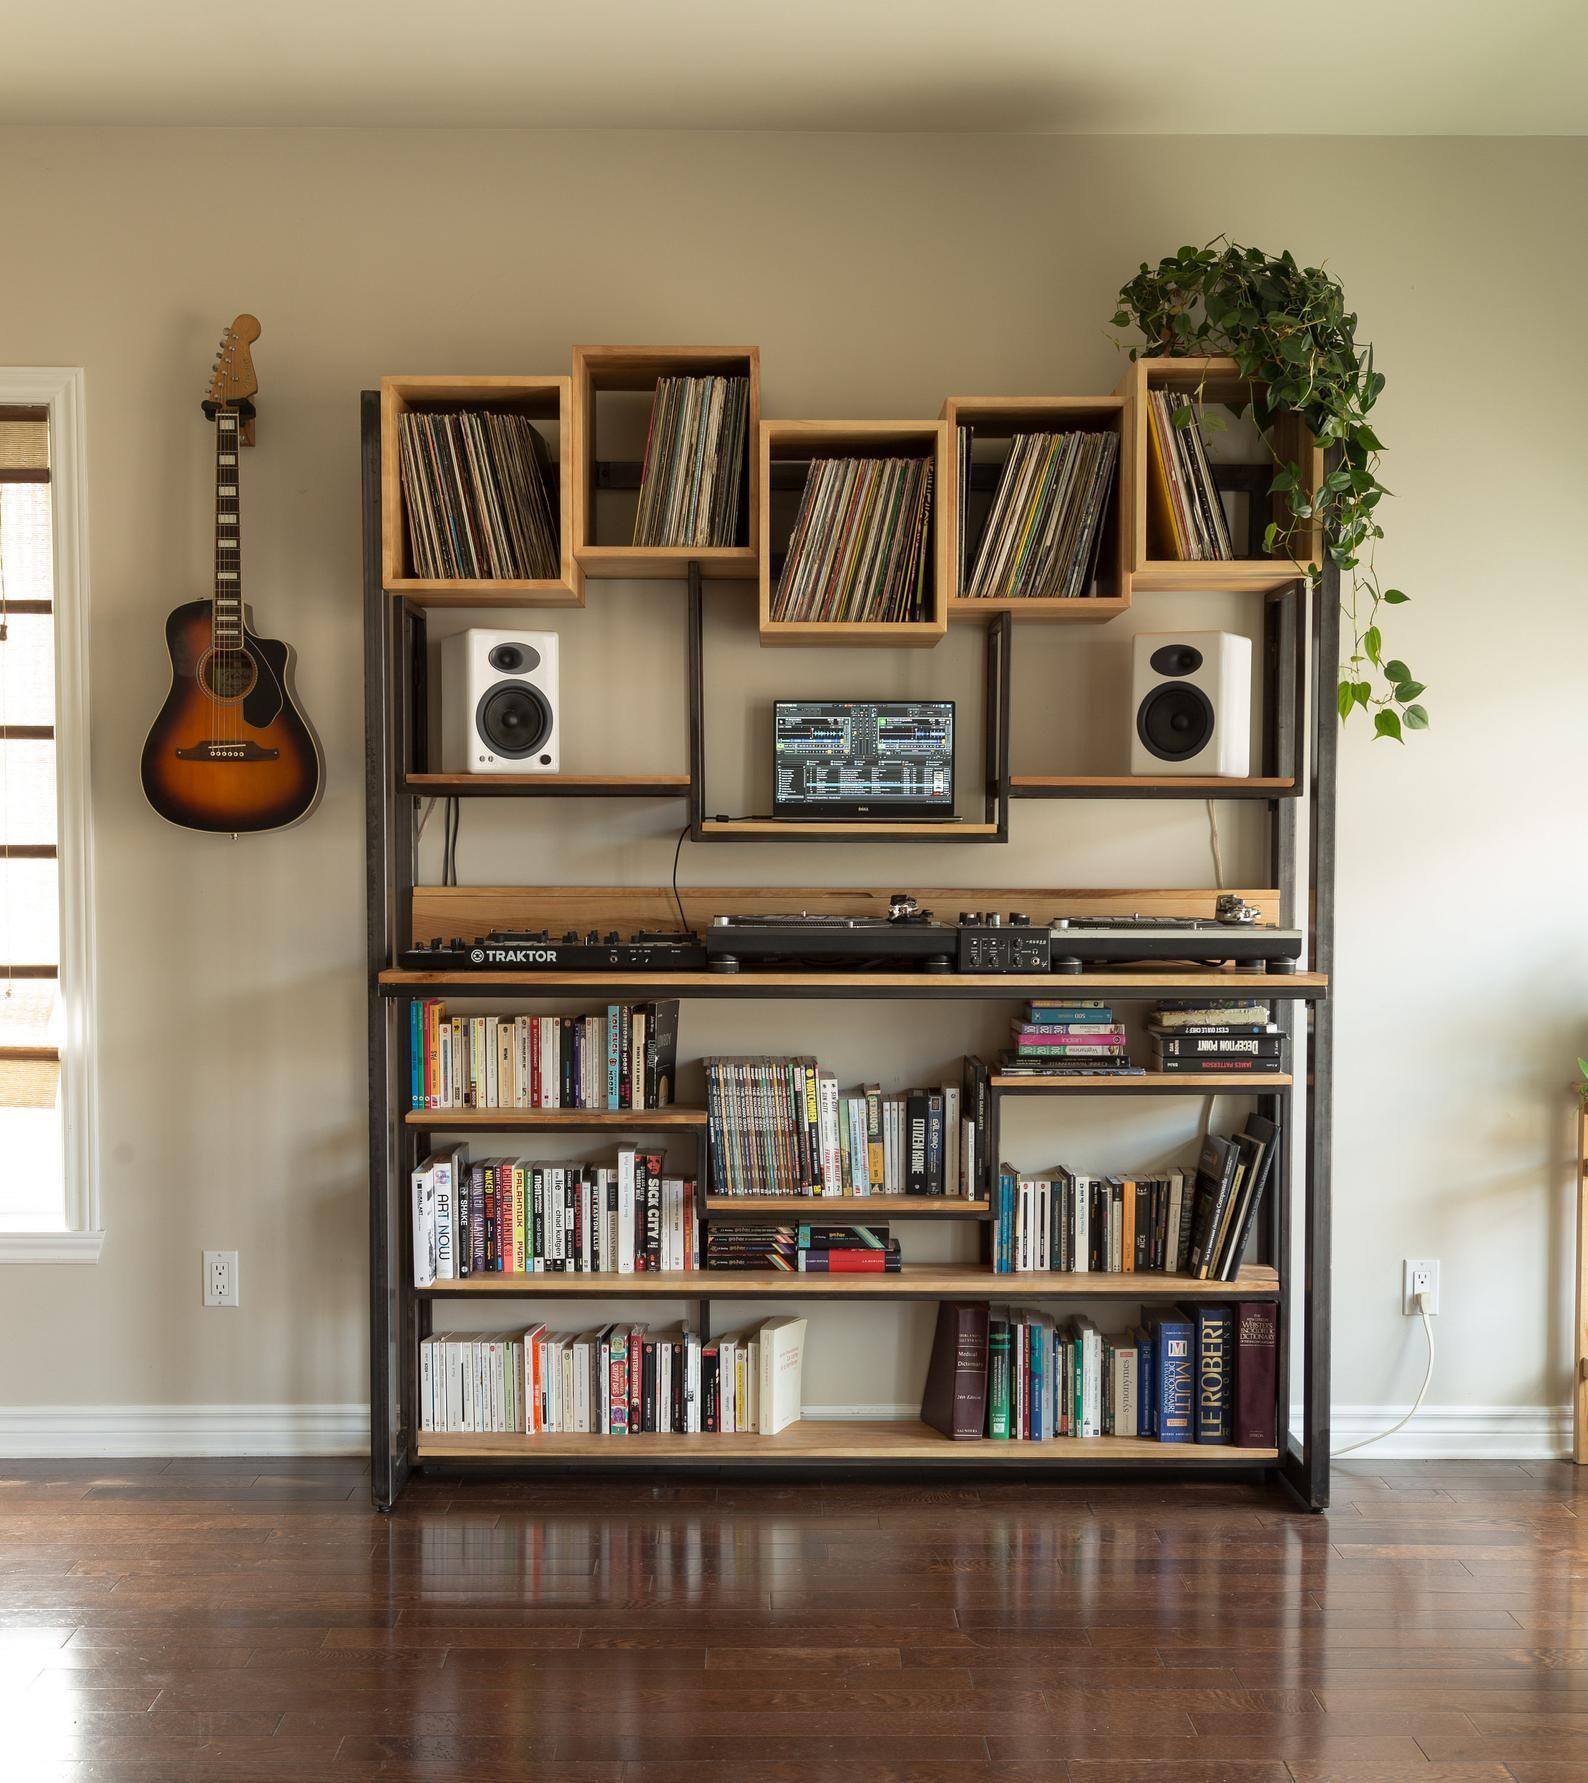 Library for DJs Platinum / Controler / Vinyl Records / Books | Etsy